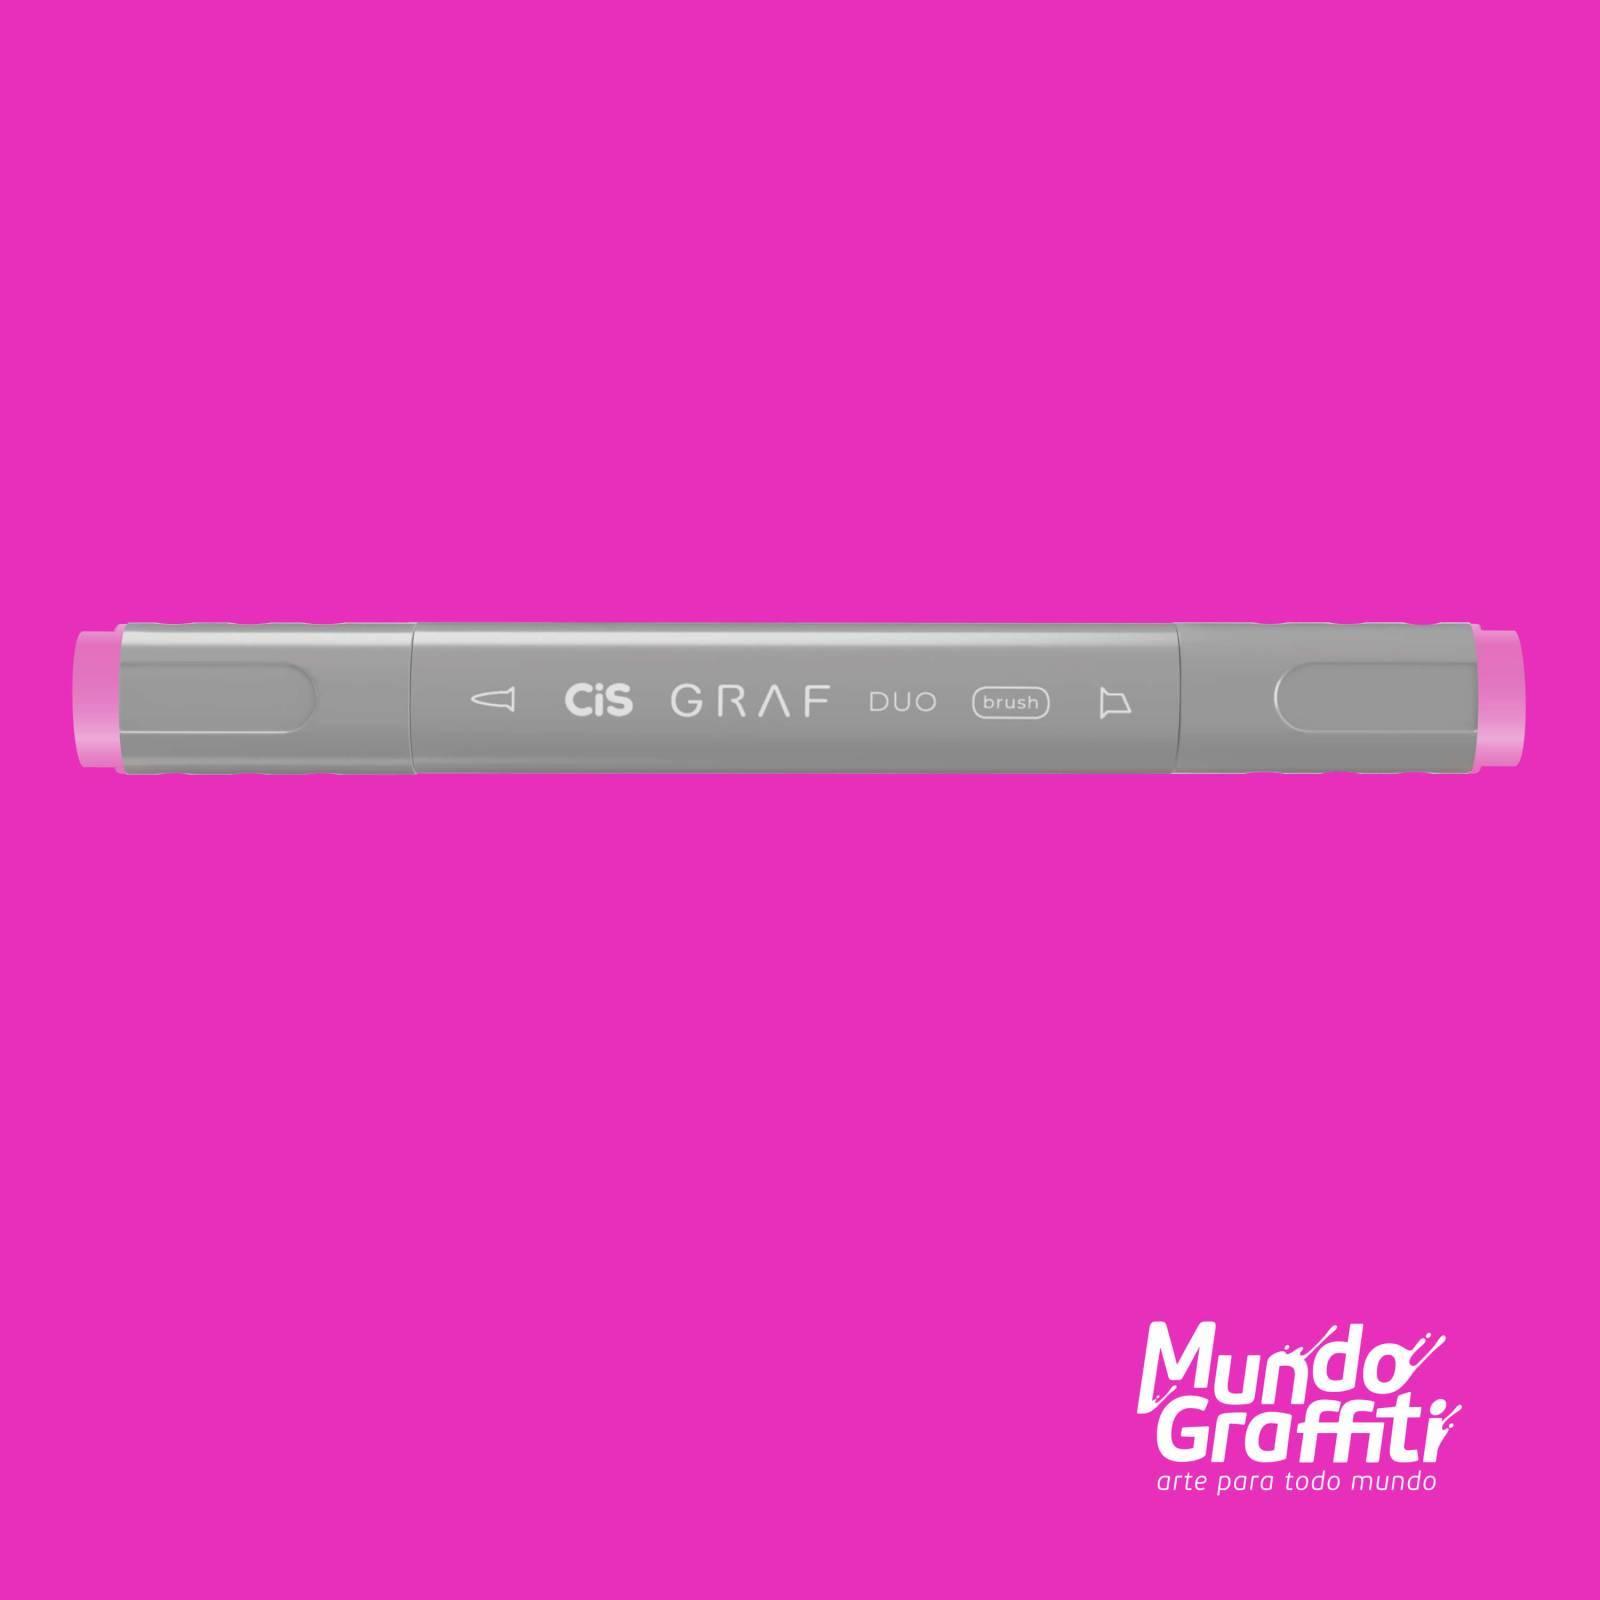 Marcador Cis Graf Duo Brush Pale Purple 89 - Mundo Graffiti